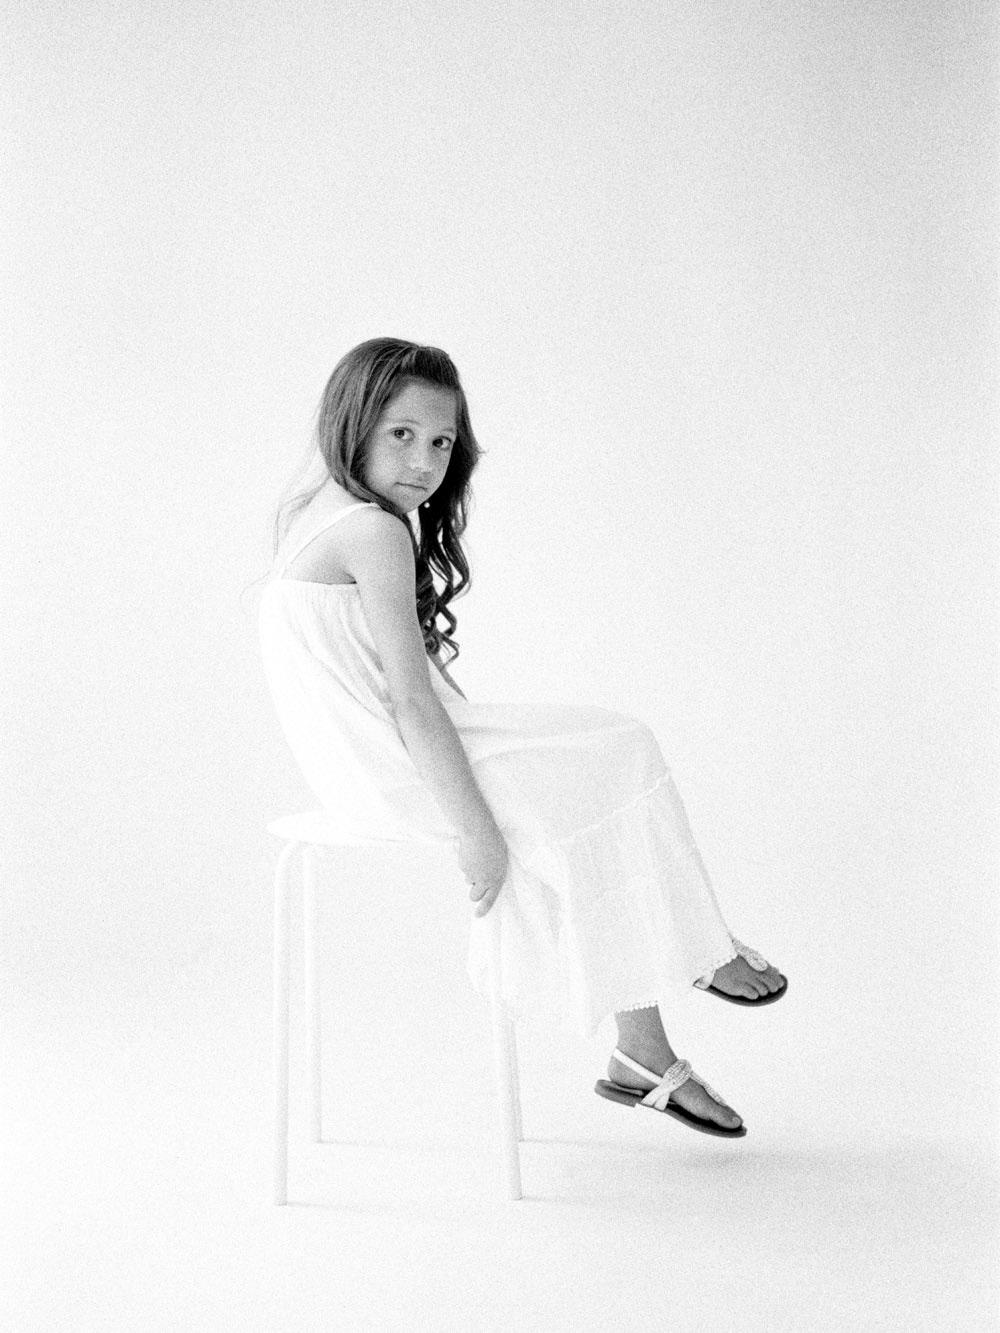 Eric-Yerke-Photography-2013-040.jpg